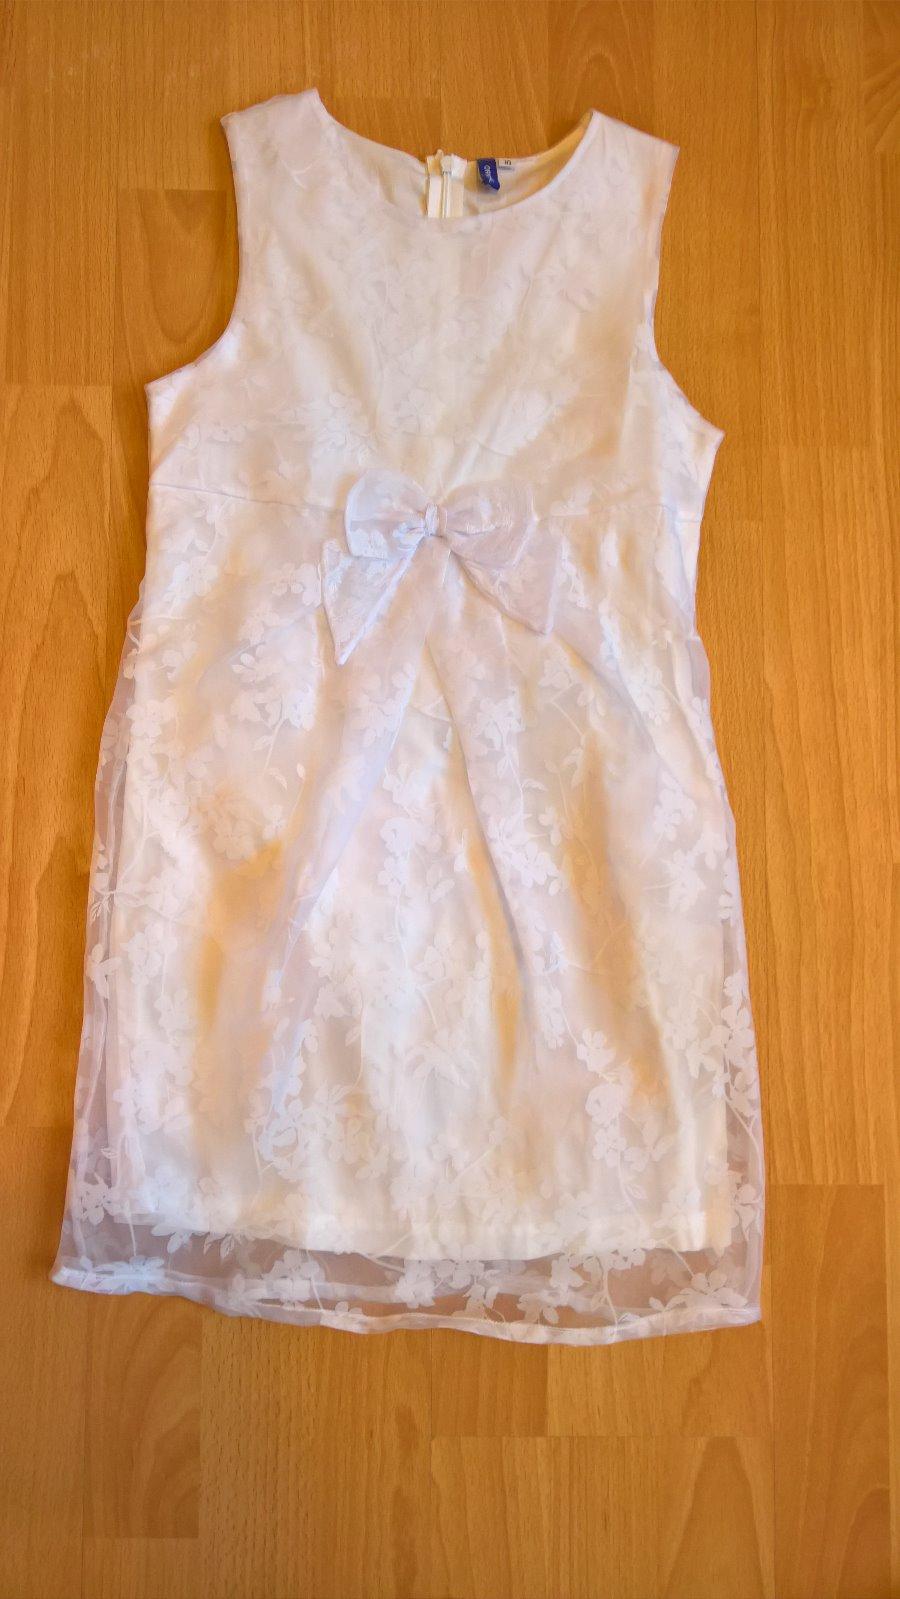 biele šaty pre slečnu - Obrázok č. 3